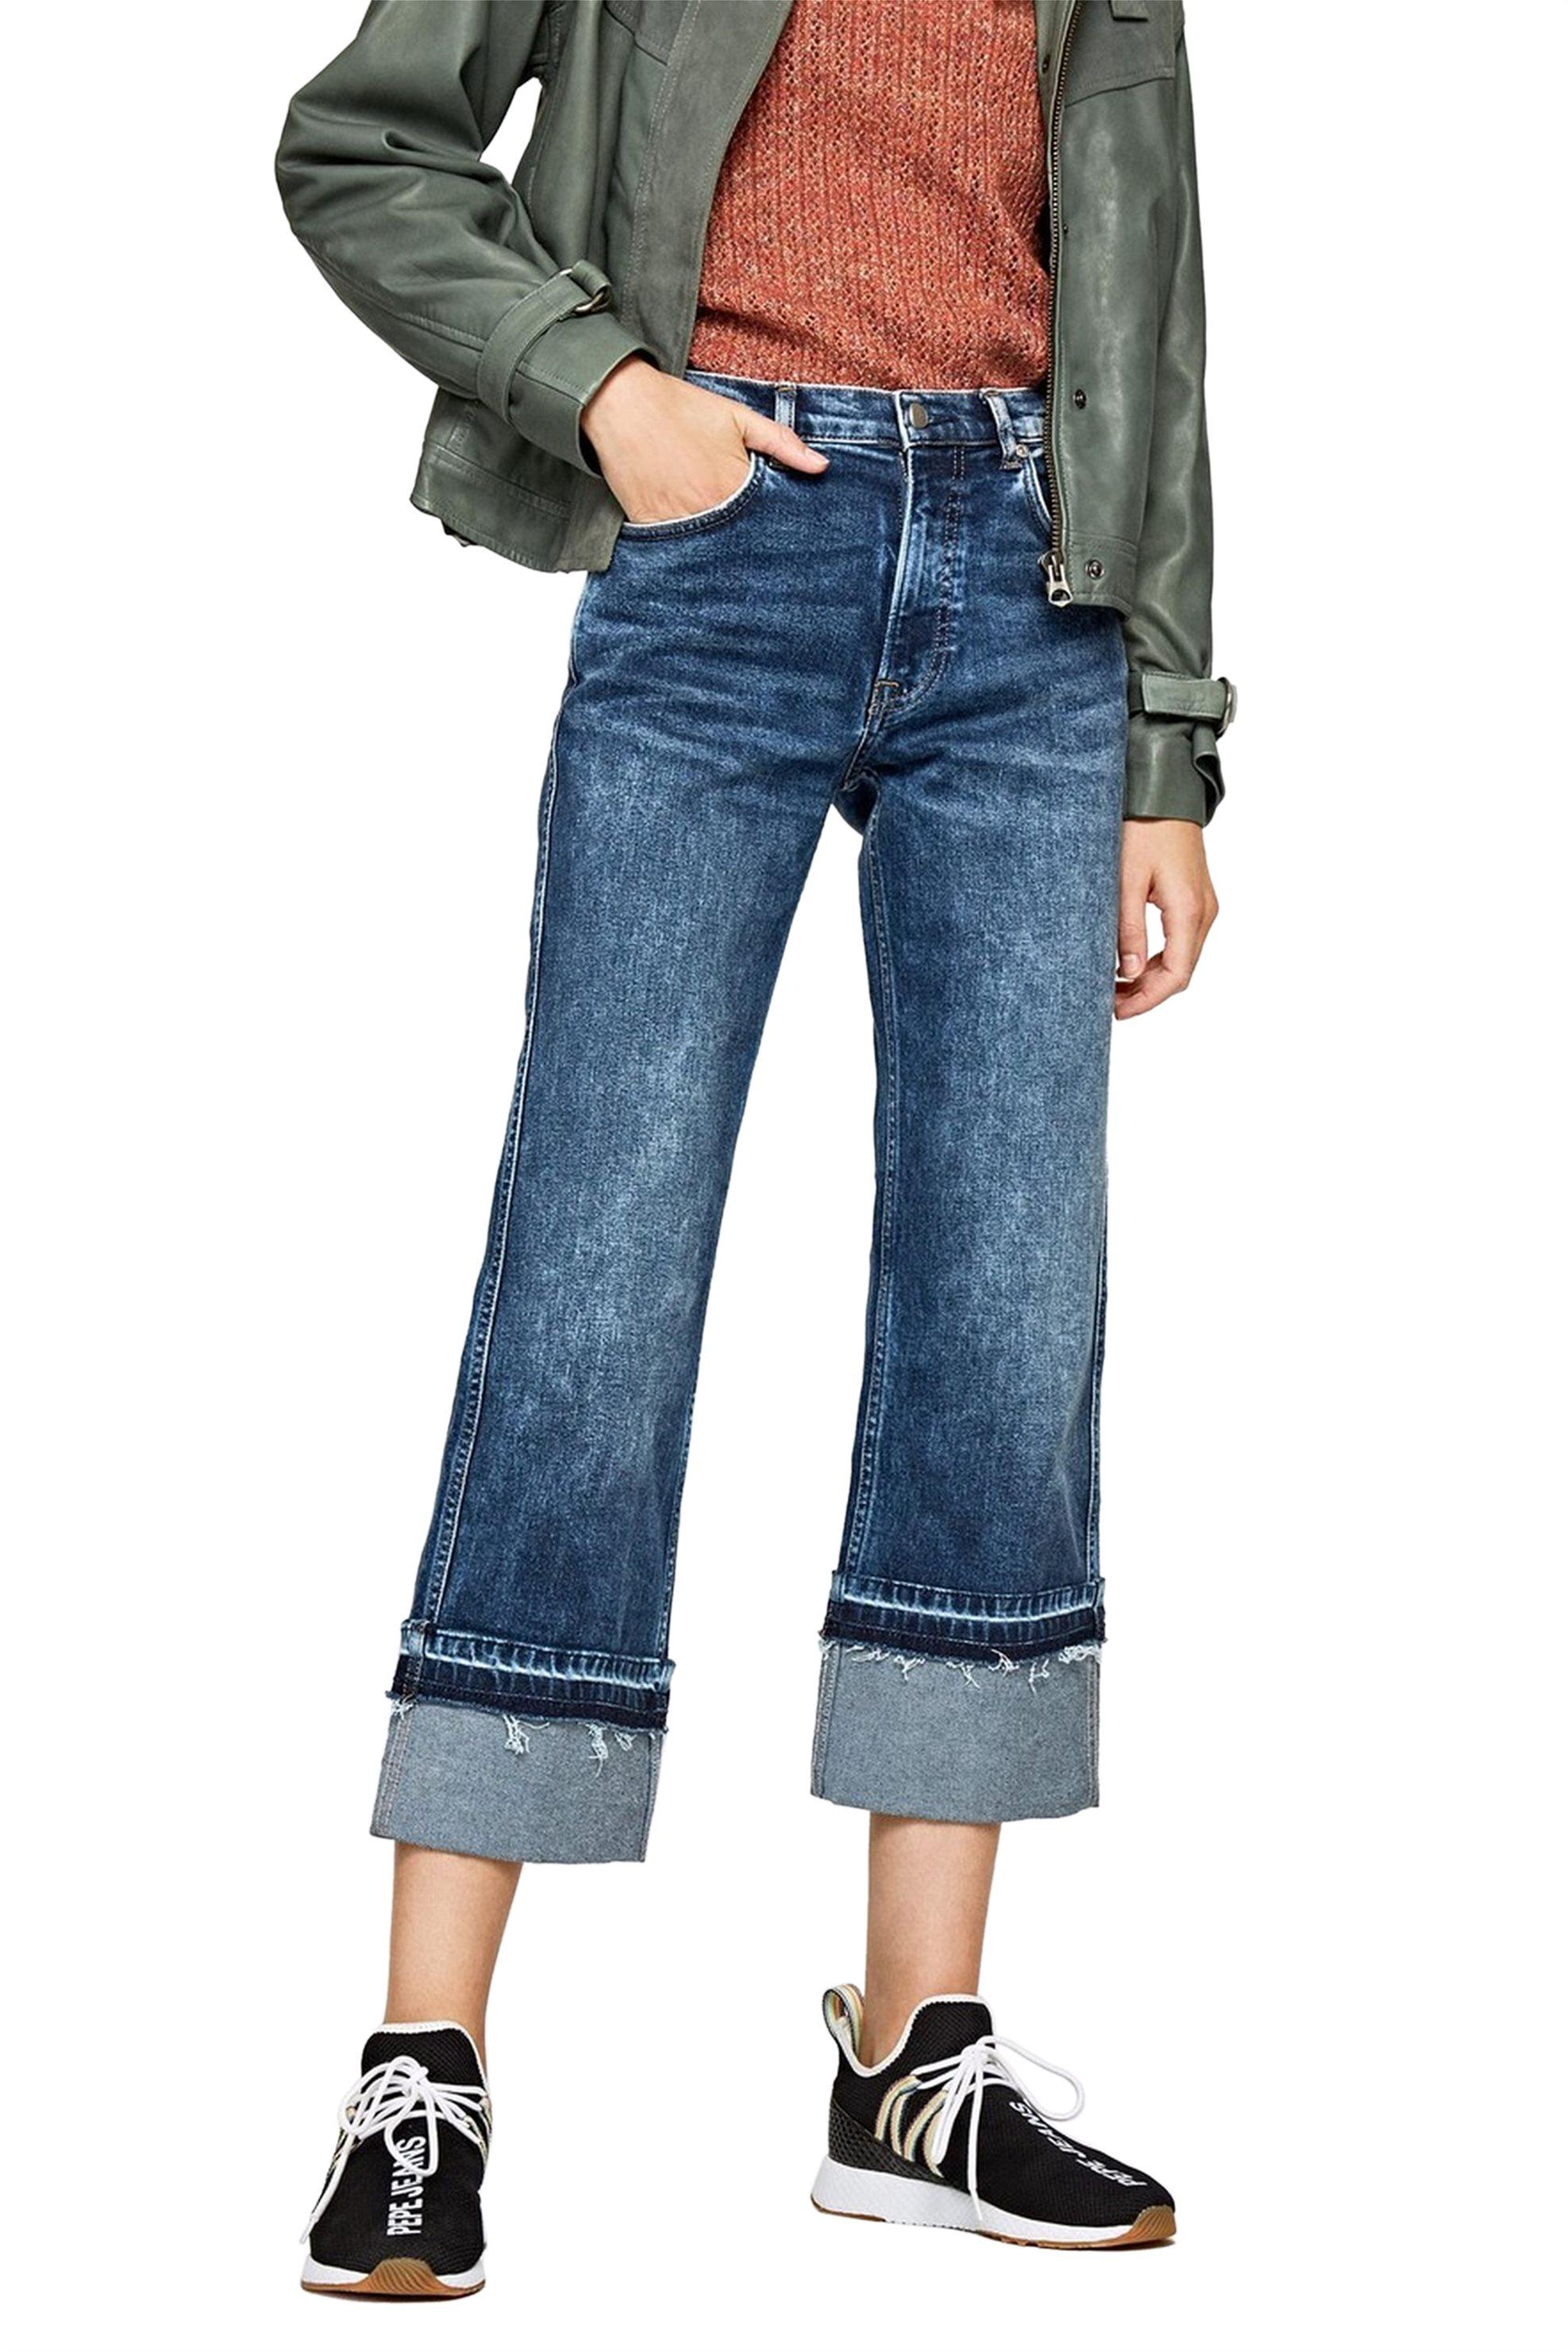 Pepe Jeans γυναικείο τζην παντελόνι Kew Mom Flare - PL202172CP1R - Μπλε γυναικα   ρουχα   jeans   straight